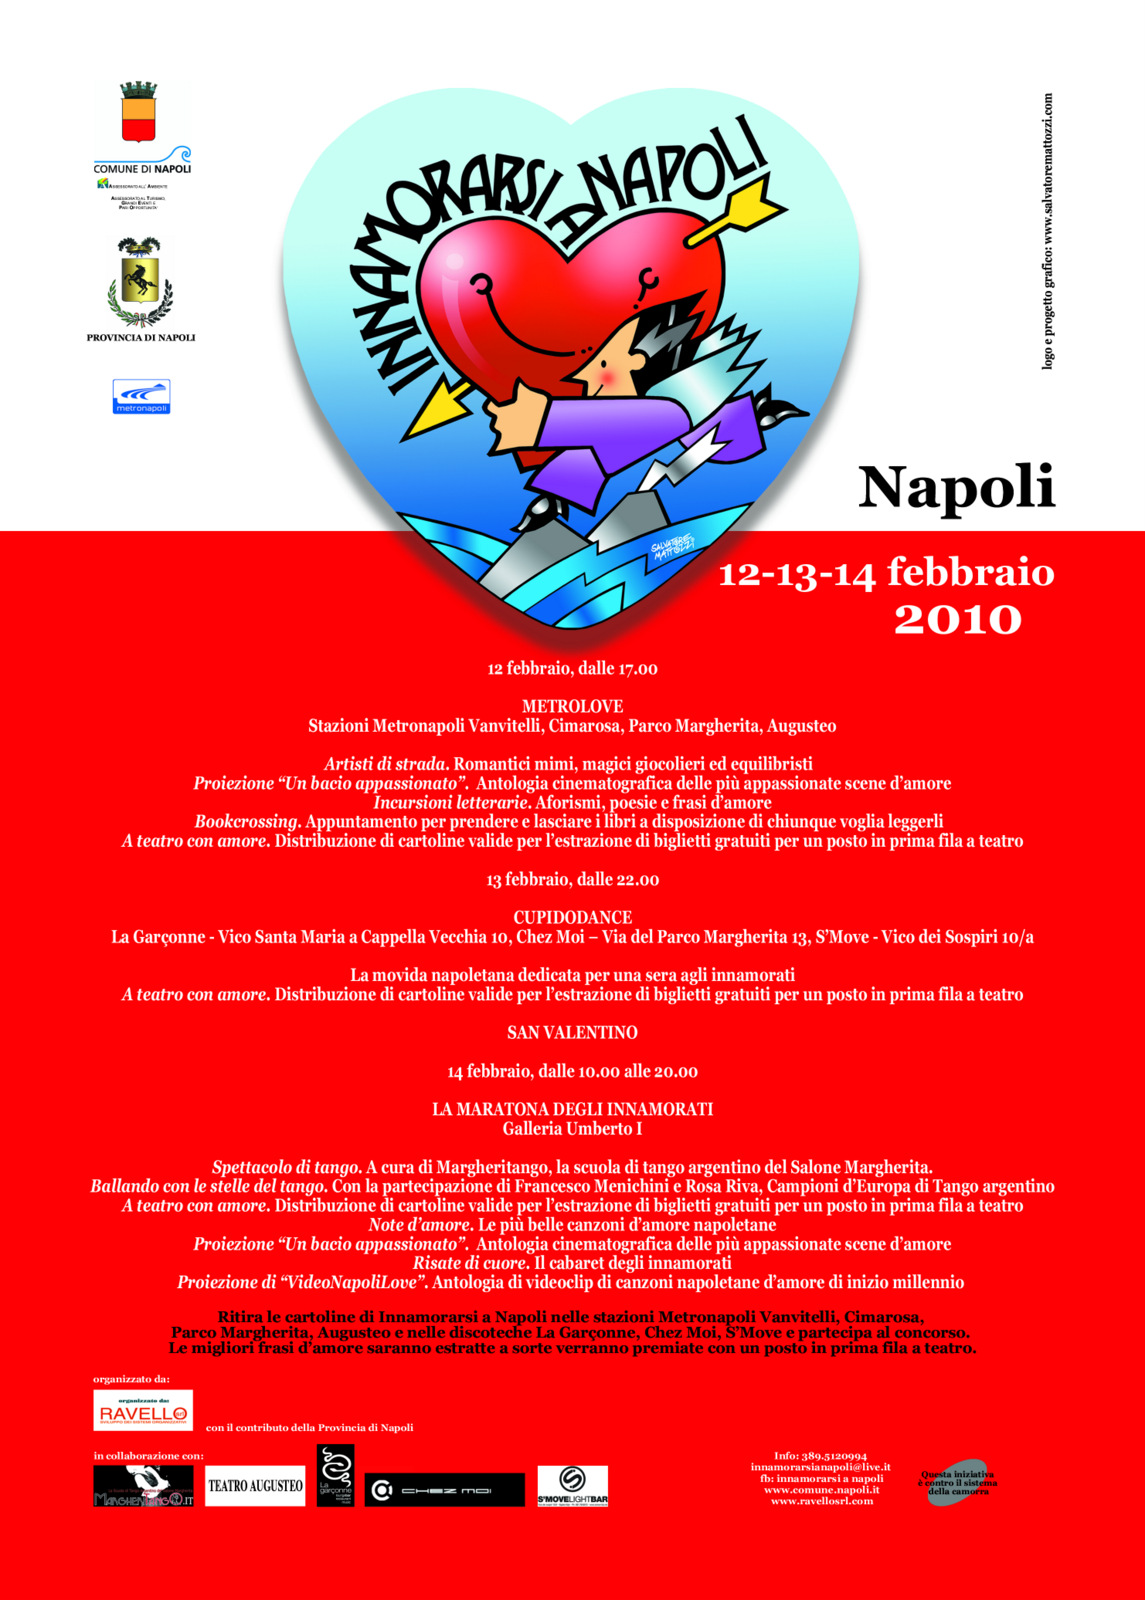 Innamorarsi a Napoli 2010